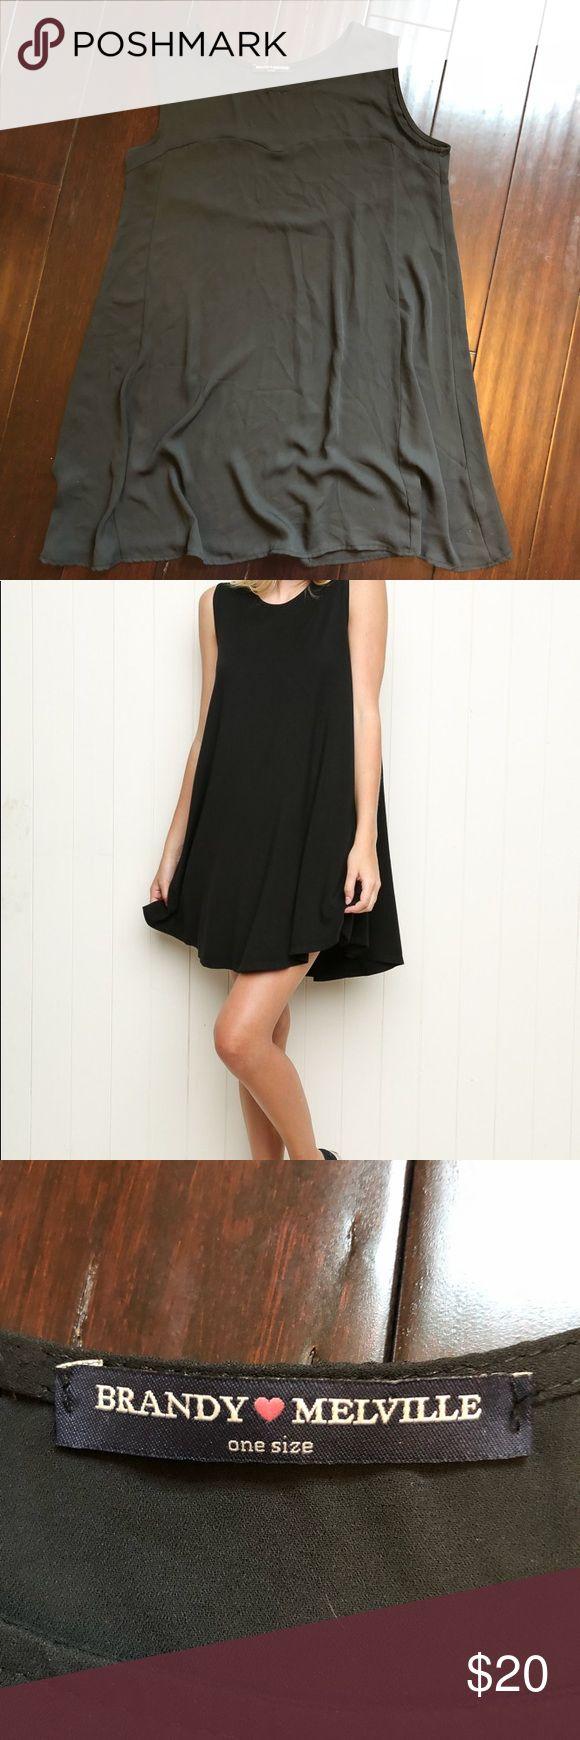 {Brandy Melville} Alena tunic dress in black •Brandy Melville one size black tunic dress •Condition: EUC, no damage found  •Size: OS Brandy Melville Dresses Midi